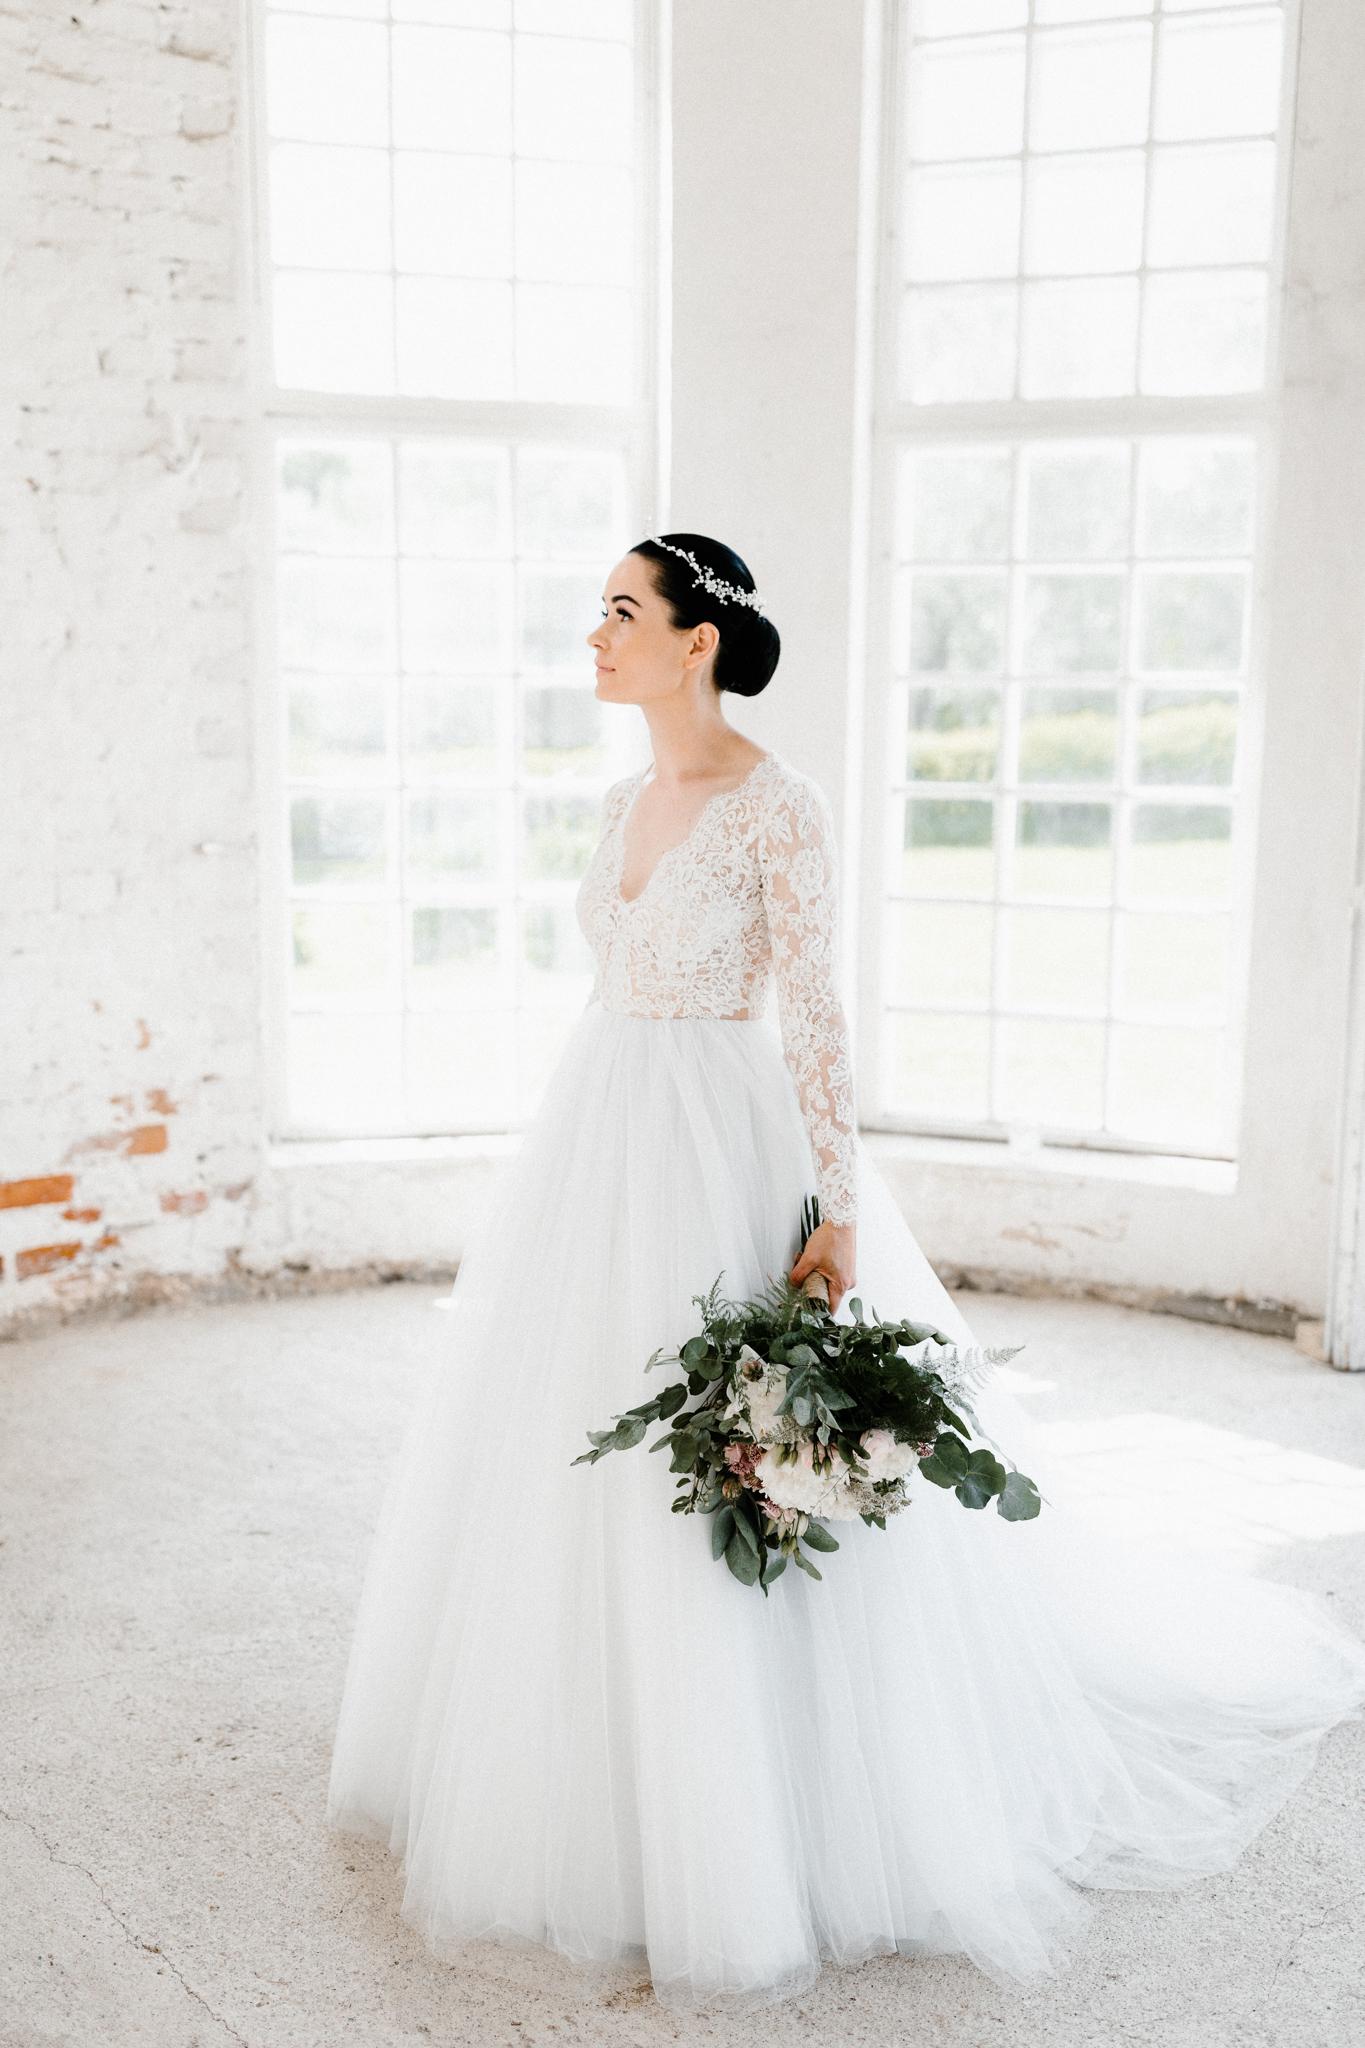 Essi + Ville   Oitbacka Gården   by Patrick Karkkolainen Wedding Photography-85.jpg